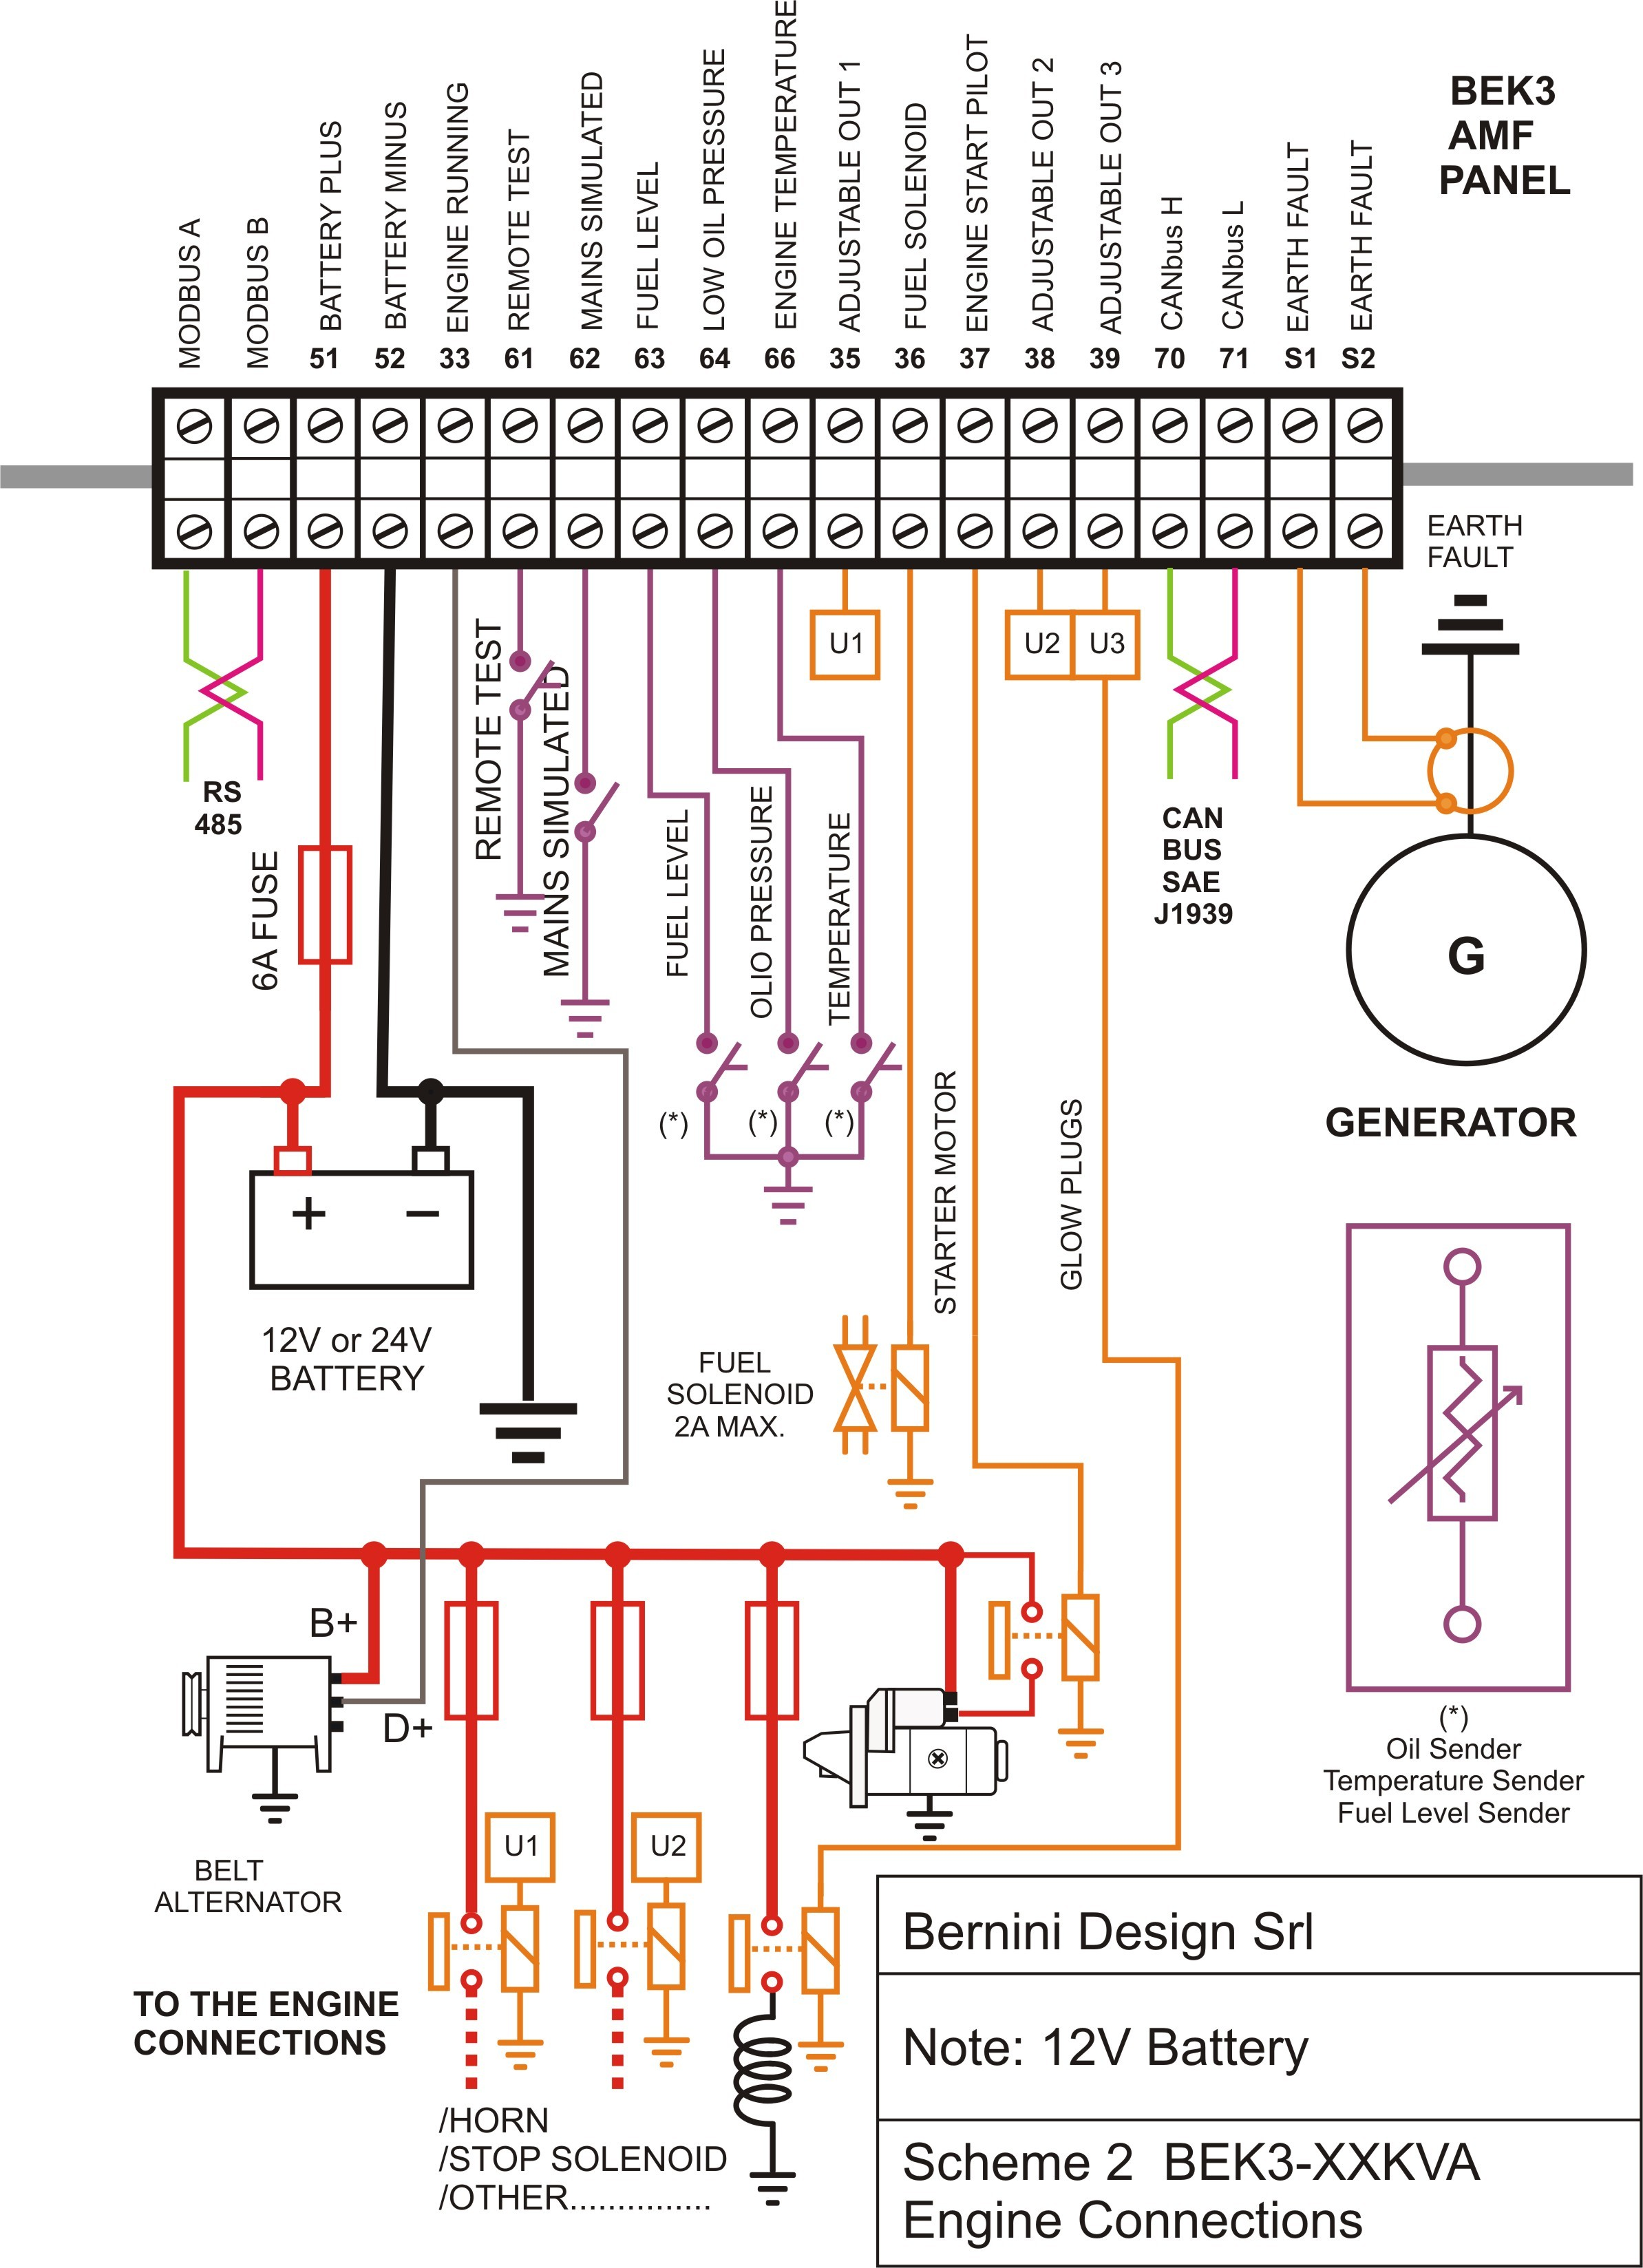 diesel engine block diagram ford f350 fuse box diagram engine rh detoxicrecenze com Fuel Filter Diagram Diesel Exhaust Fuel